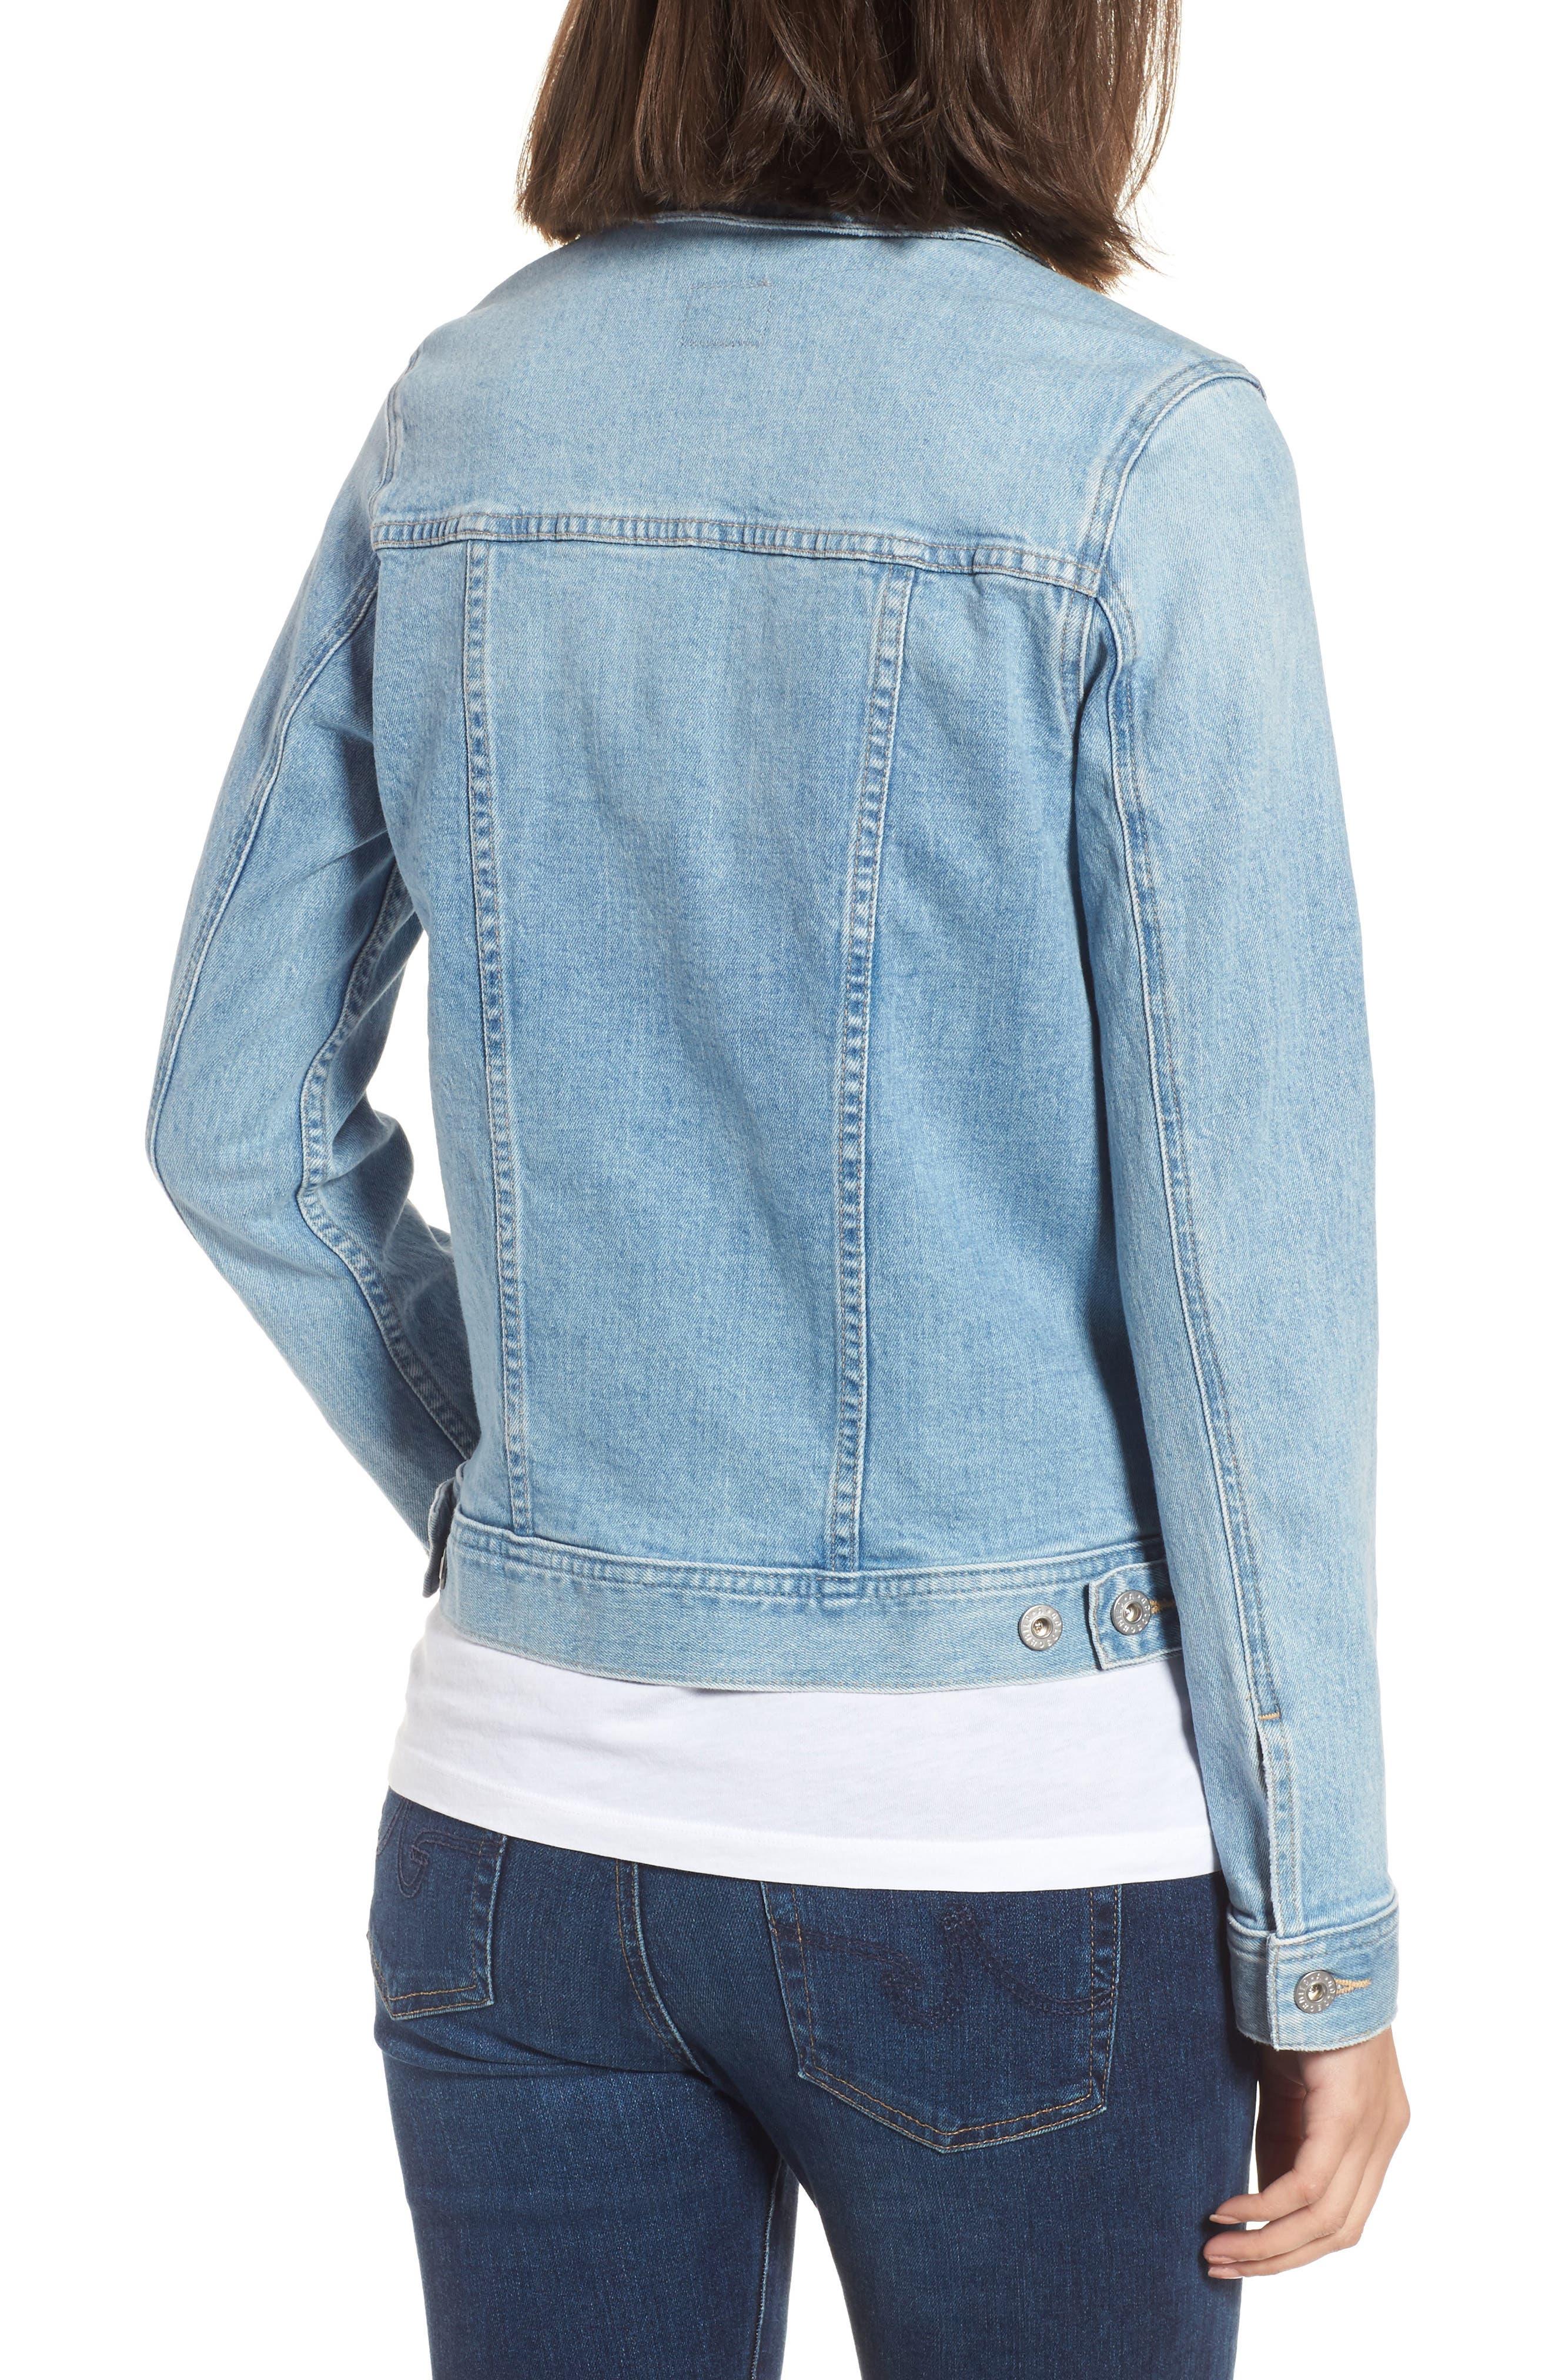 Mya Denim Jacket,                             Alternate thumbnail 2, color,                             SUNLIGHT BLUE